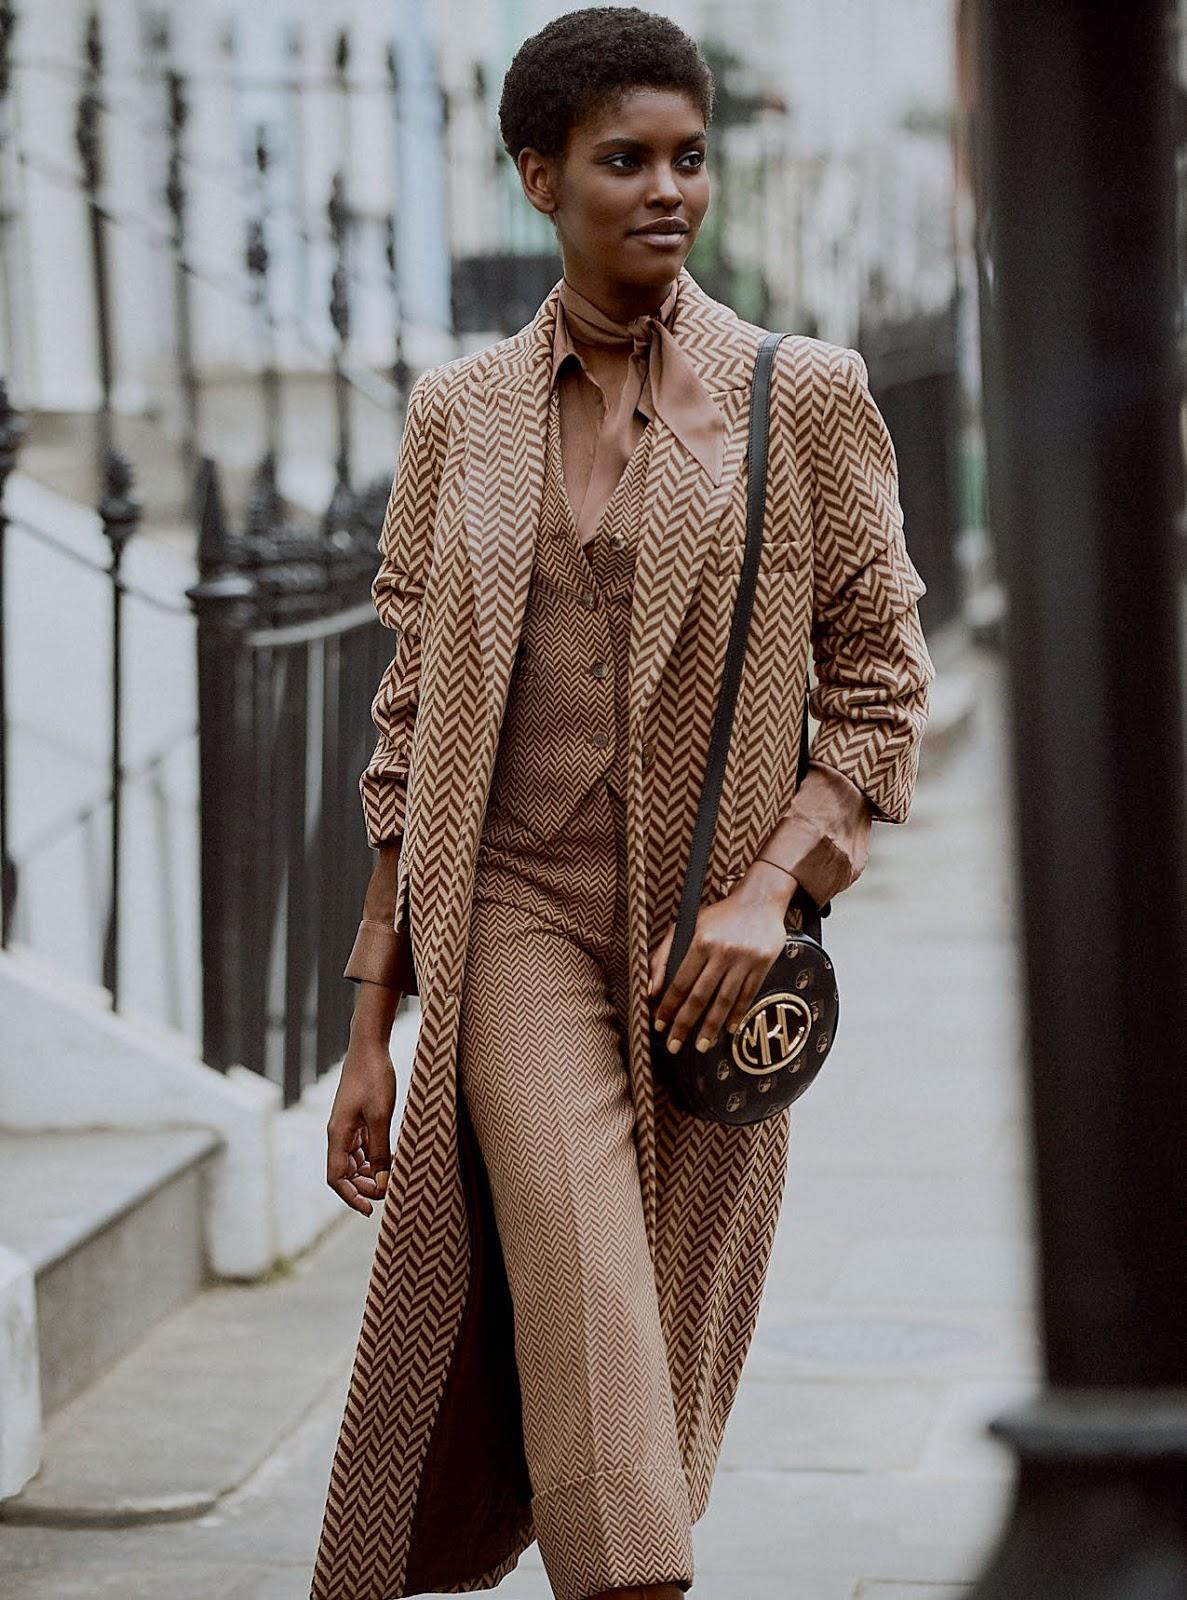 Amilna Estevao by Regan Cameron for Harper's Bazaar UK Sept 2019 (5).jpg